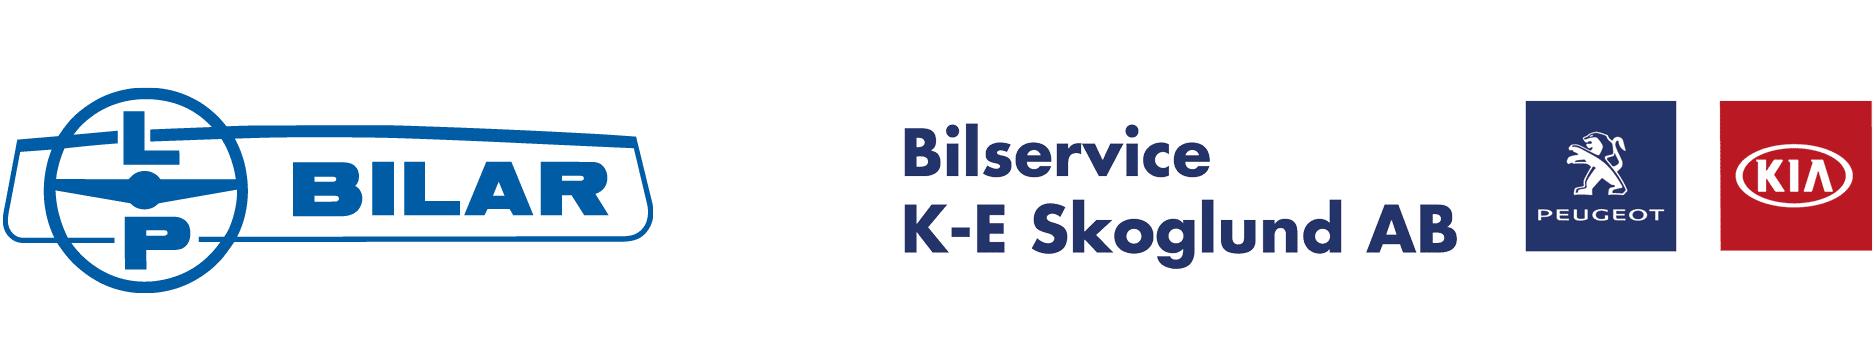 LP Bilar & Skoglunds Bilservice